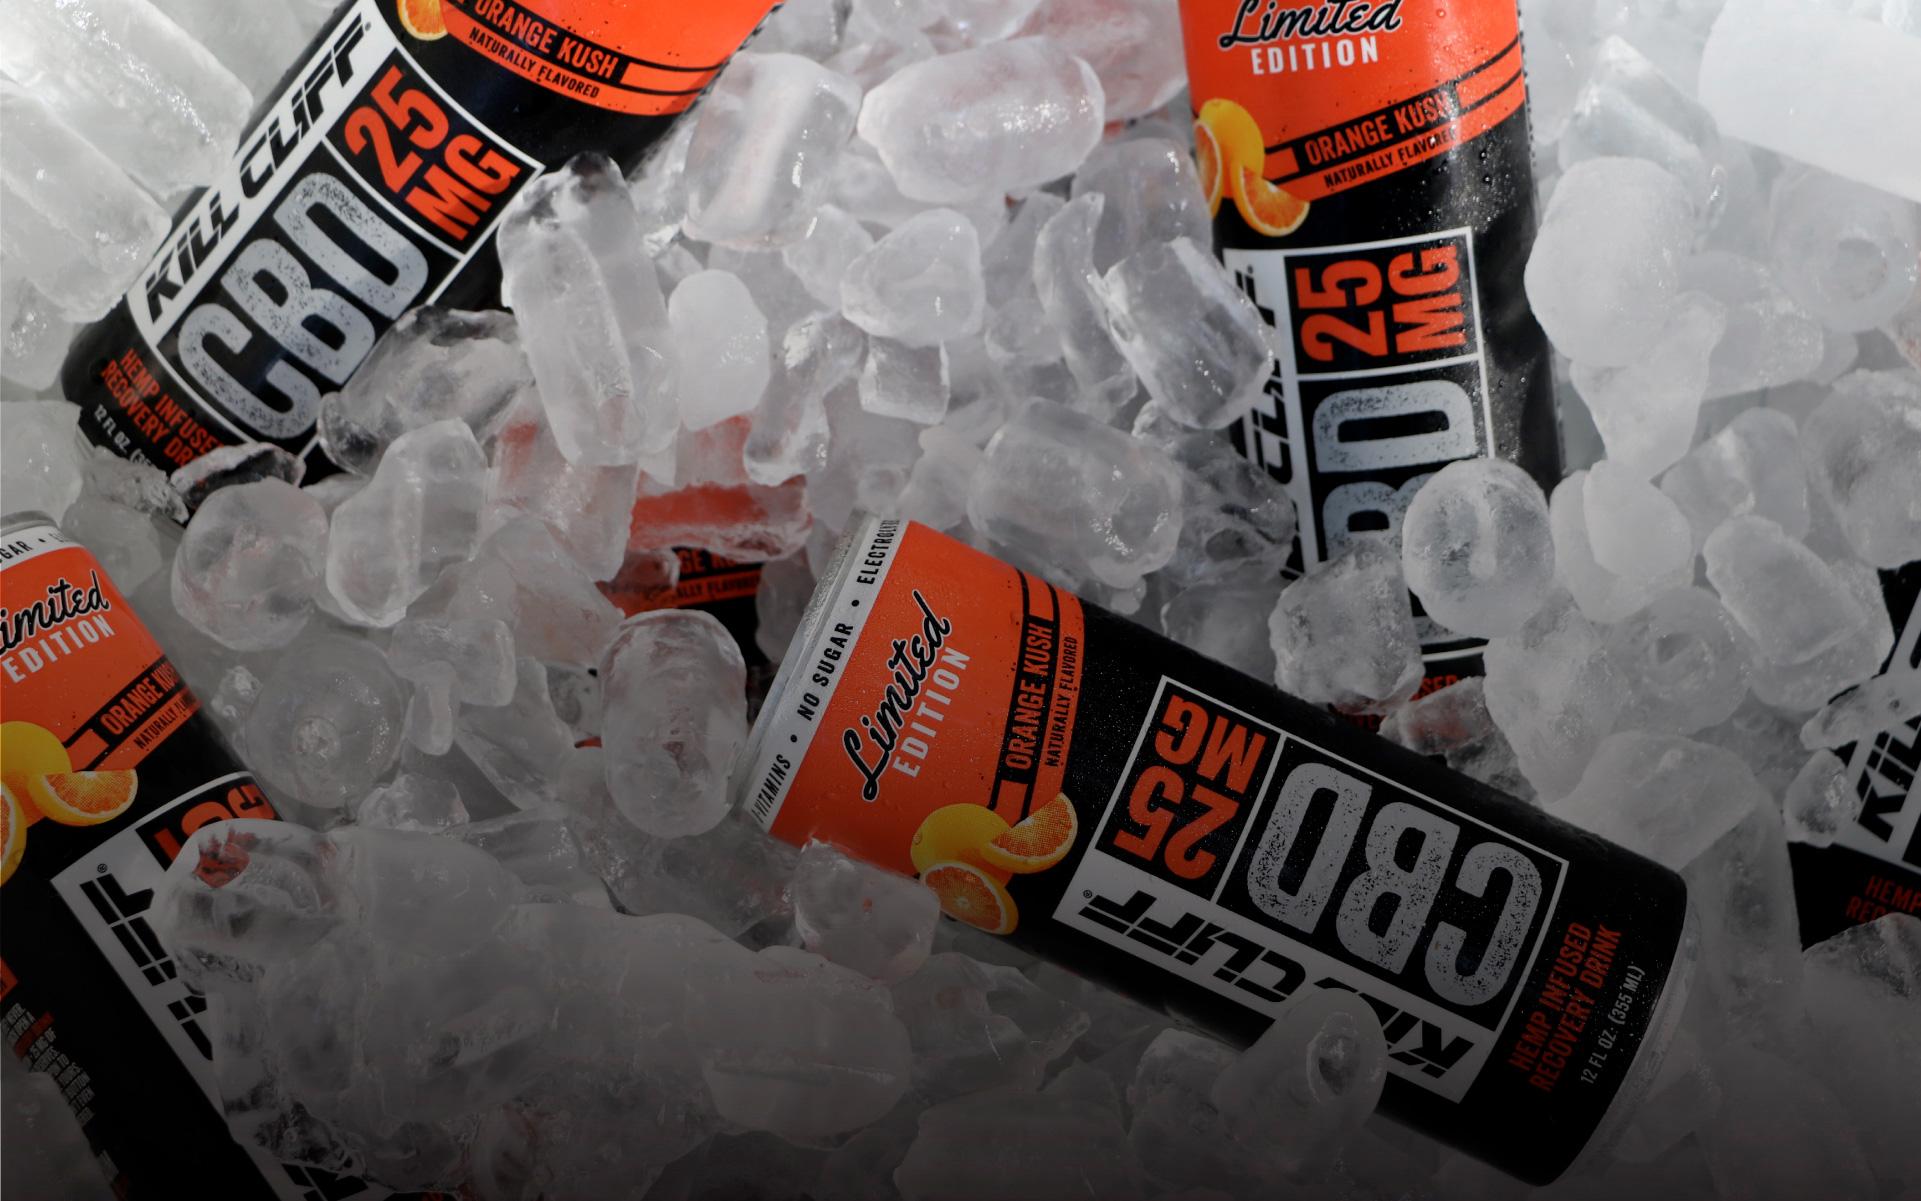 cbd beverages, hemp infused recovery drink, full spectrum cbd infused beverage